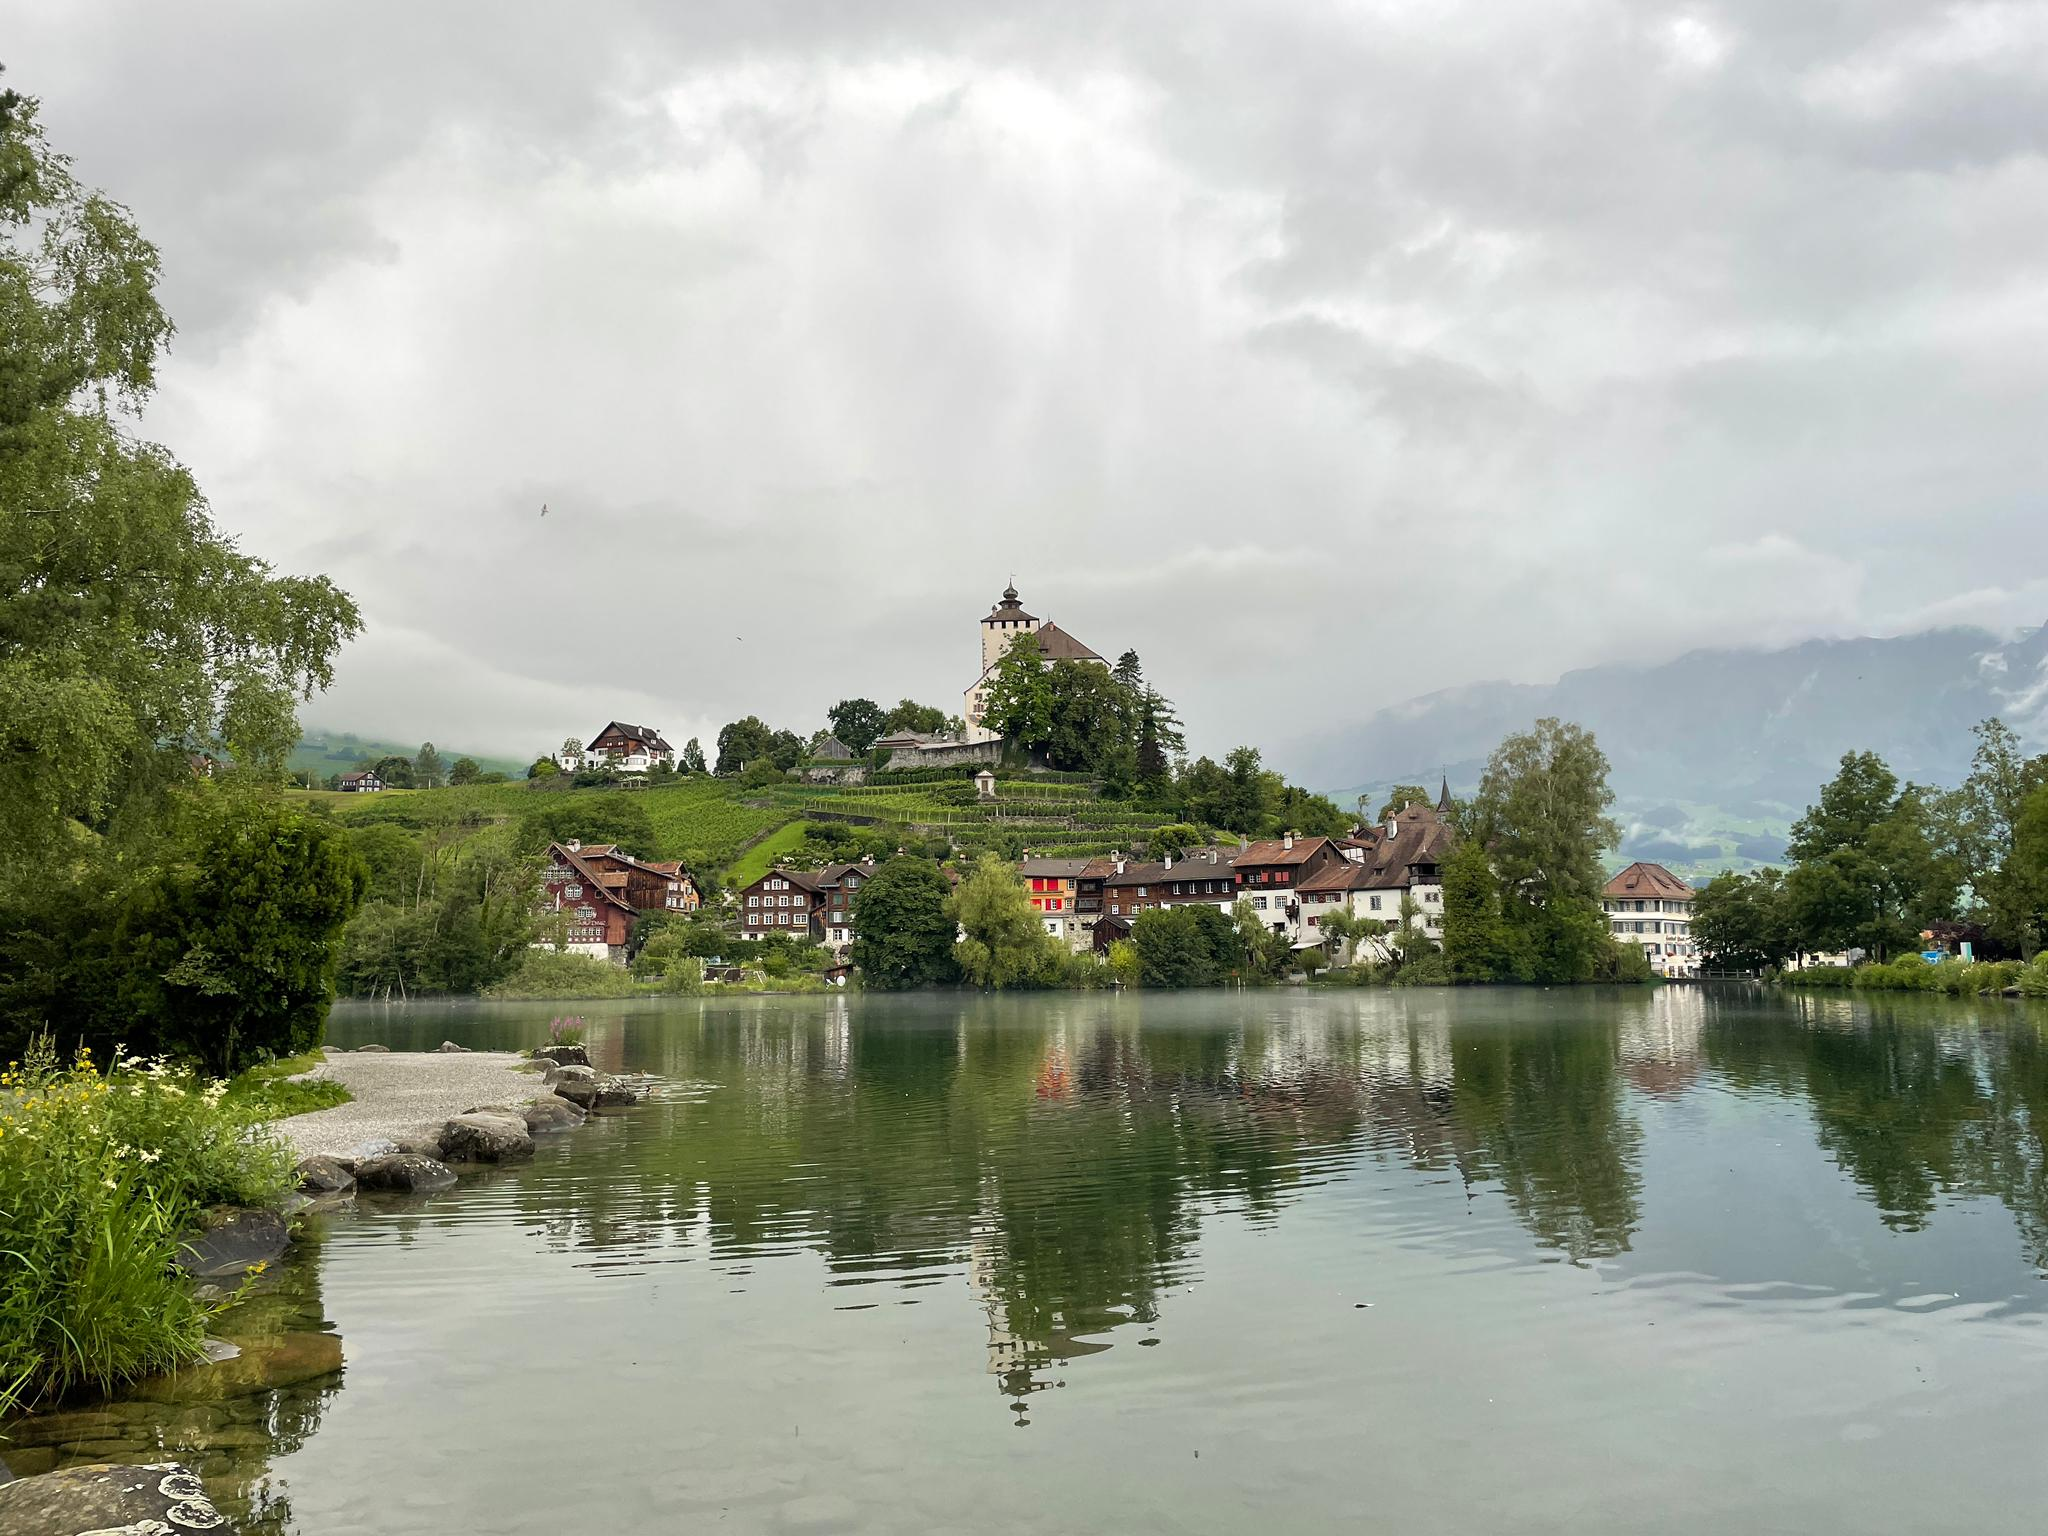 Voyage de la famille Cavadini: le village de Werdenberg